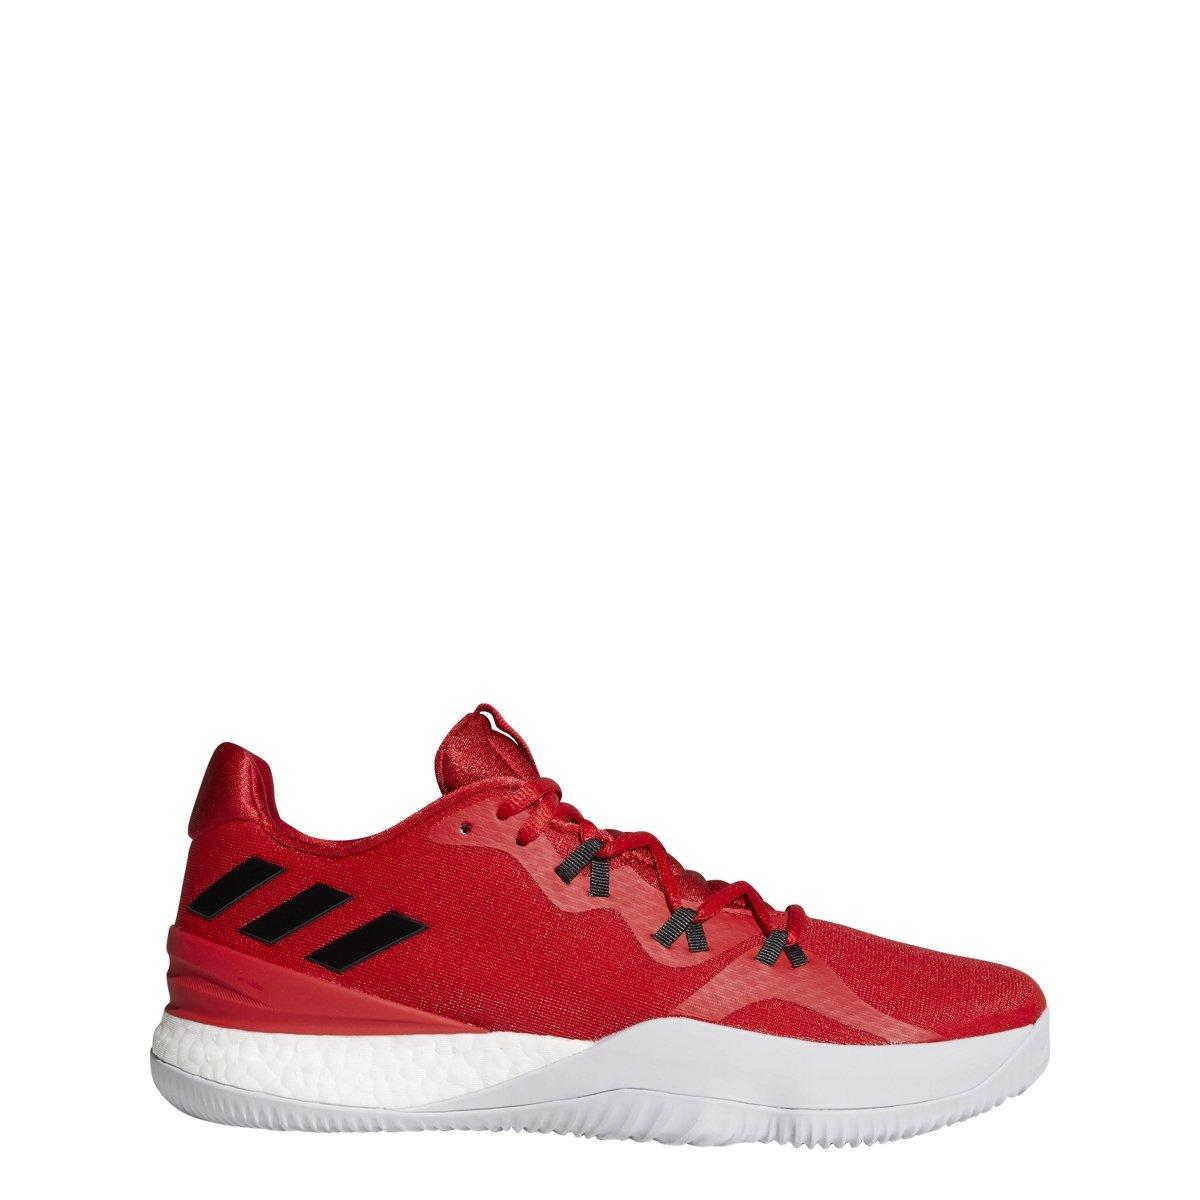 adidas Crazy Light Boost 2018 Shoe Men's Basketball B07BCNH8LN 8.5 D(M) US|Scarlet/Core Black/White (Db1069)